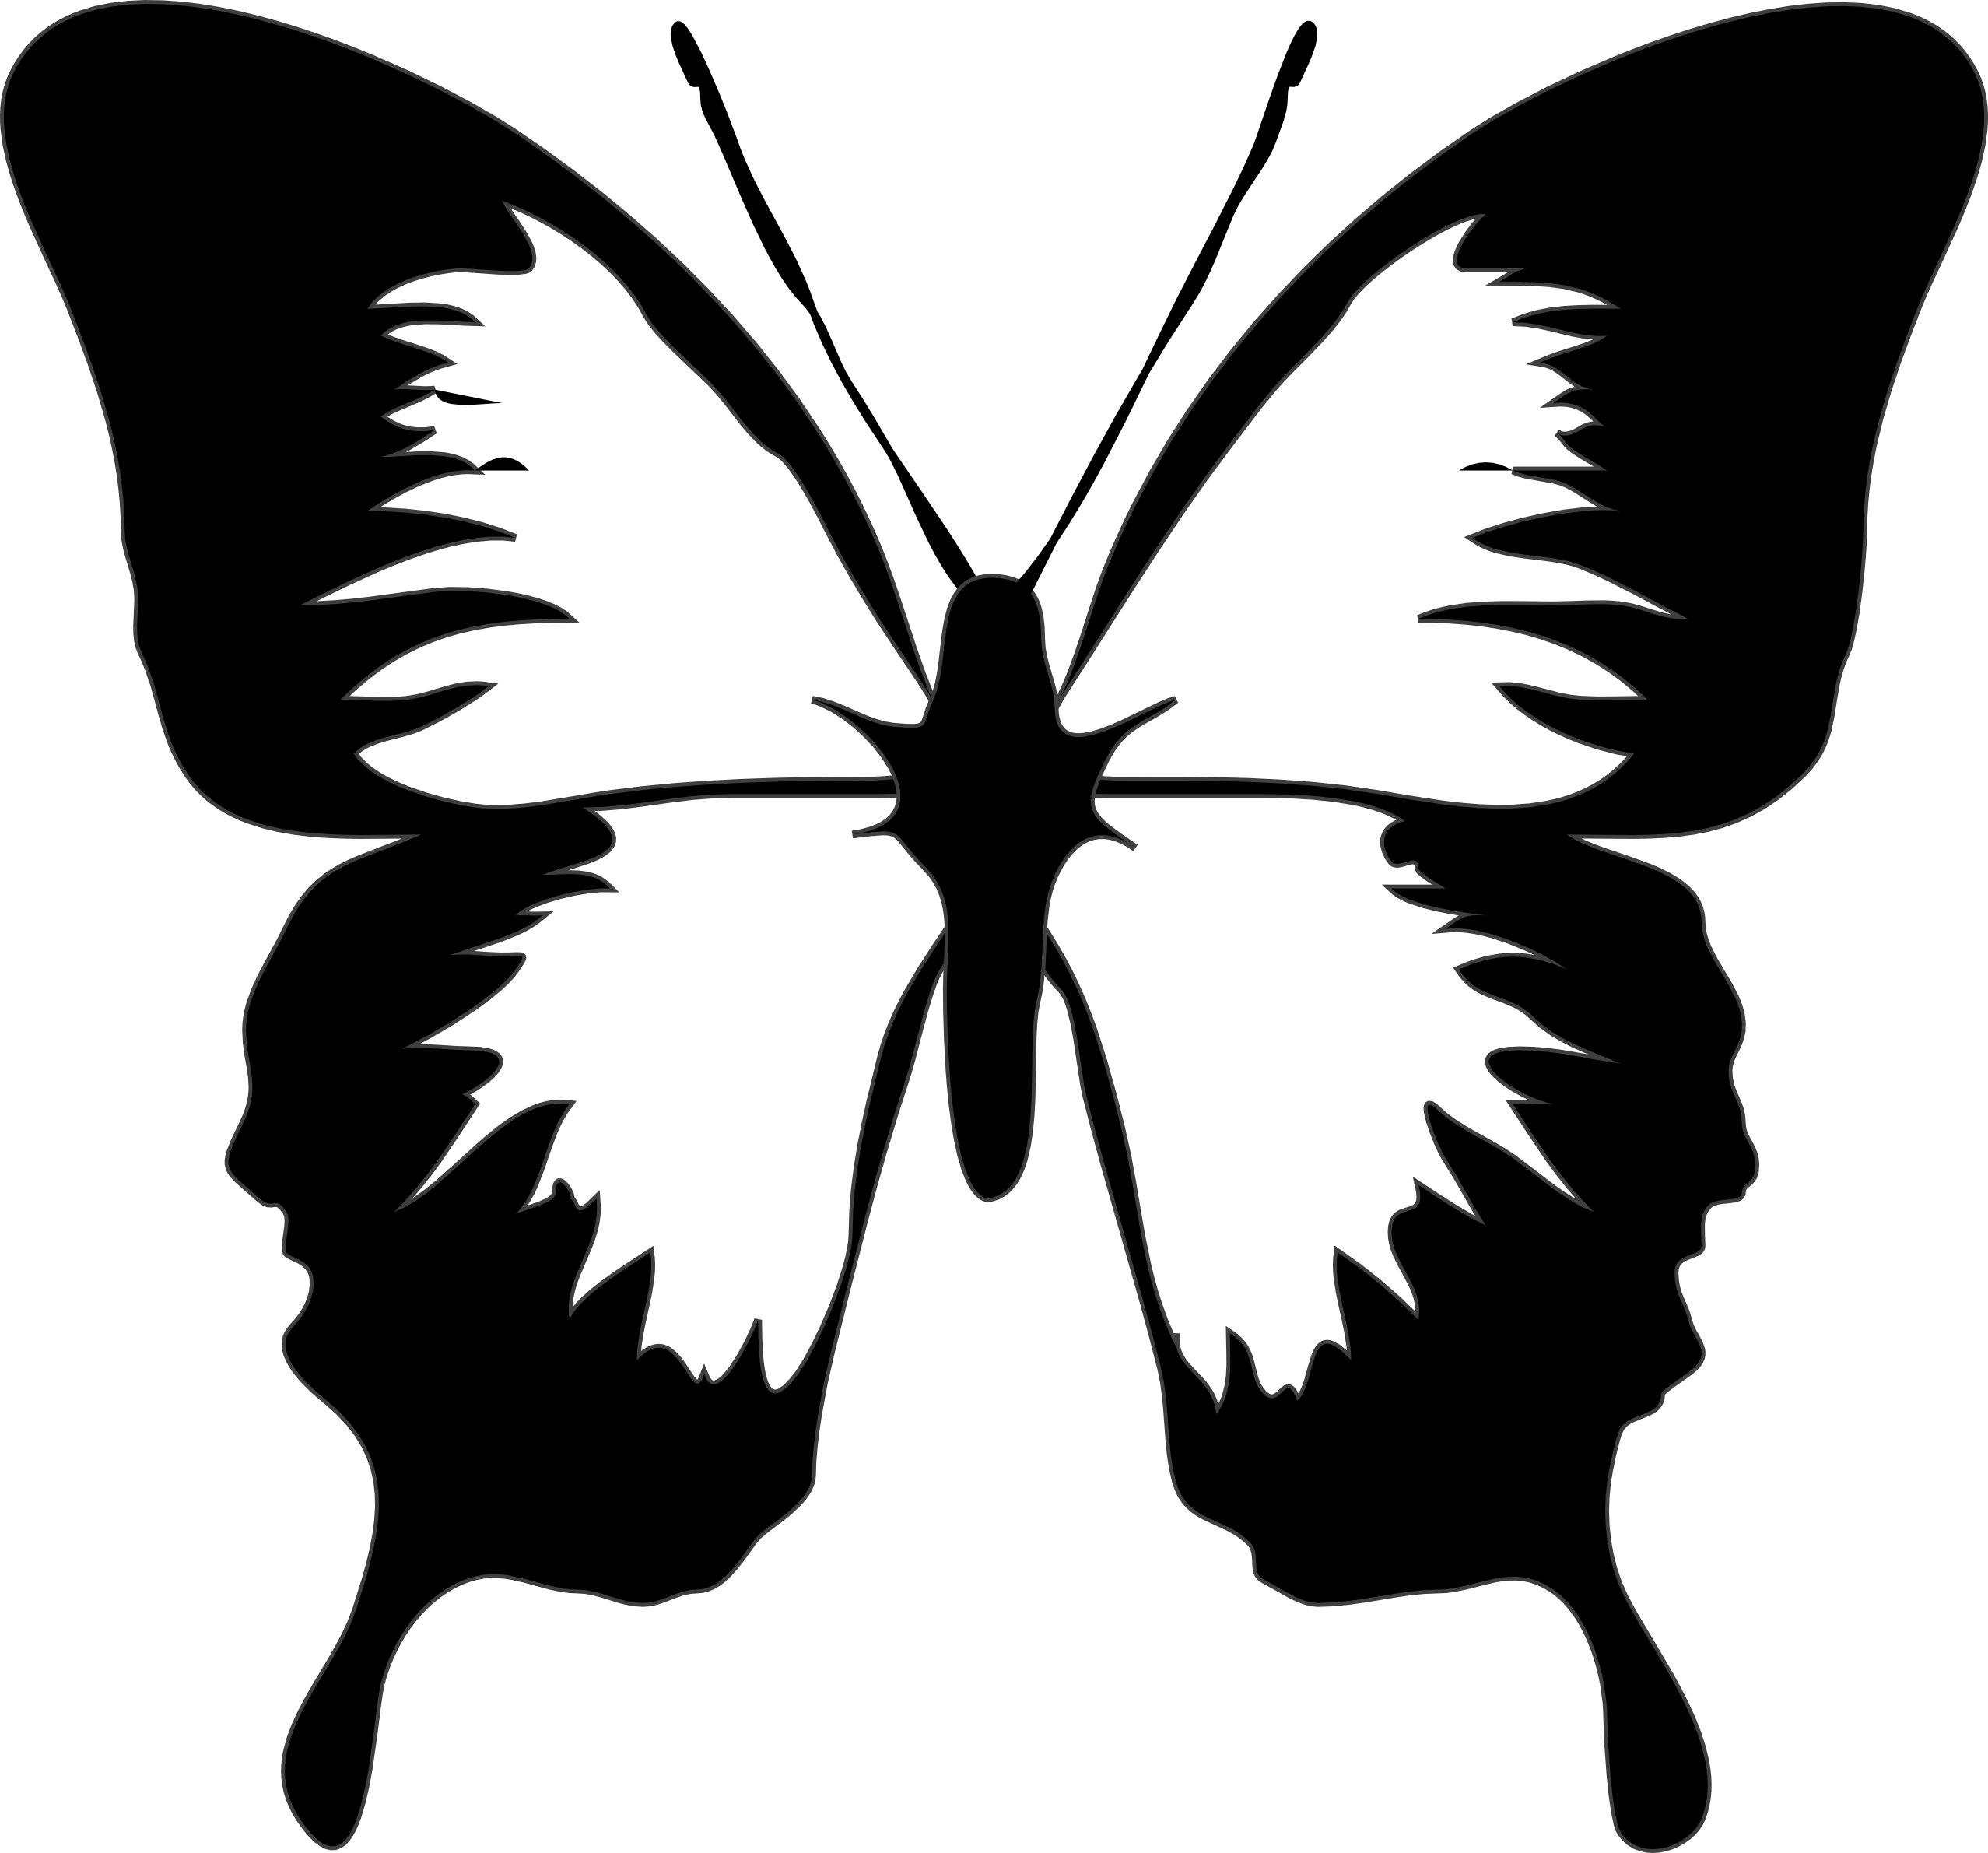 2555x2381 Butterfly Clip Art Black And White Nteeb9gta